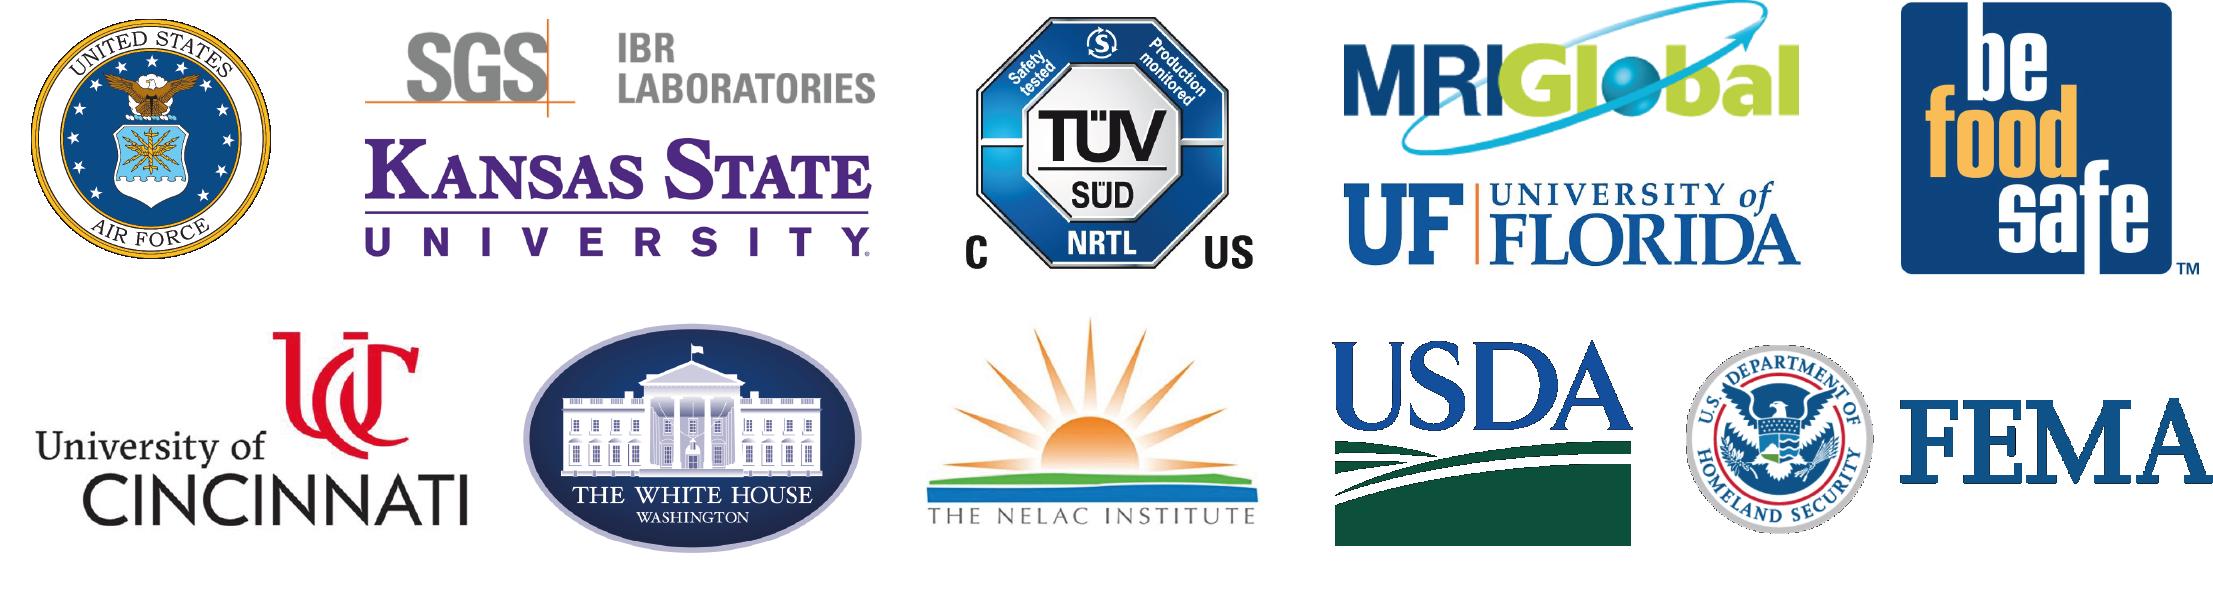 PHI-Accreditation-Logos